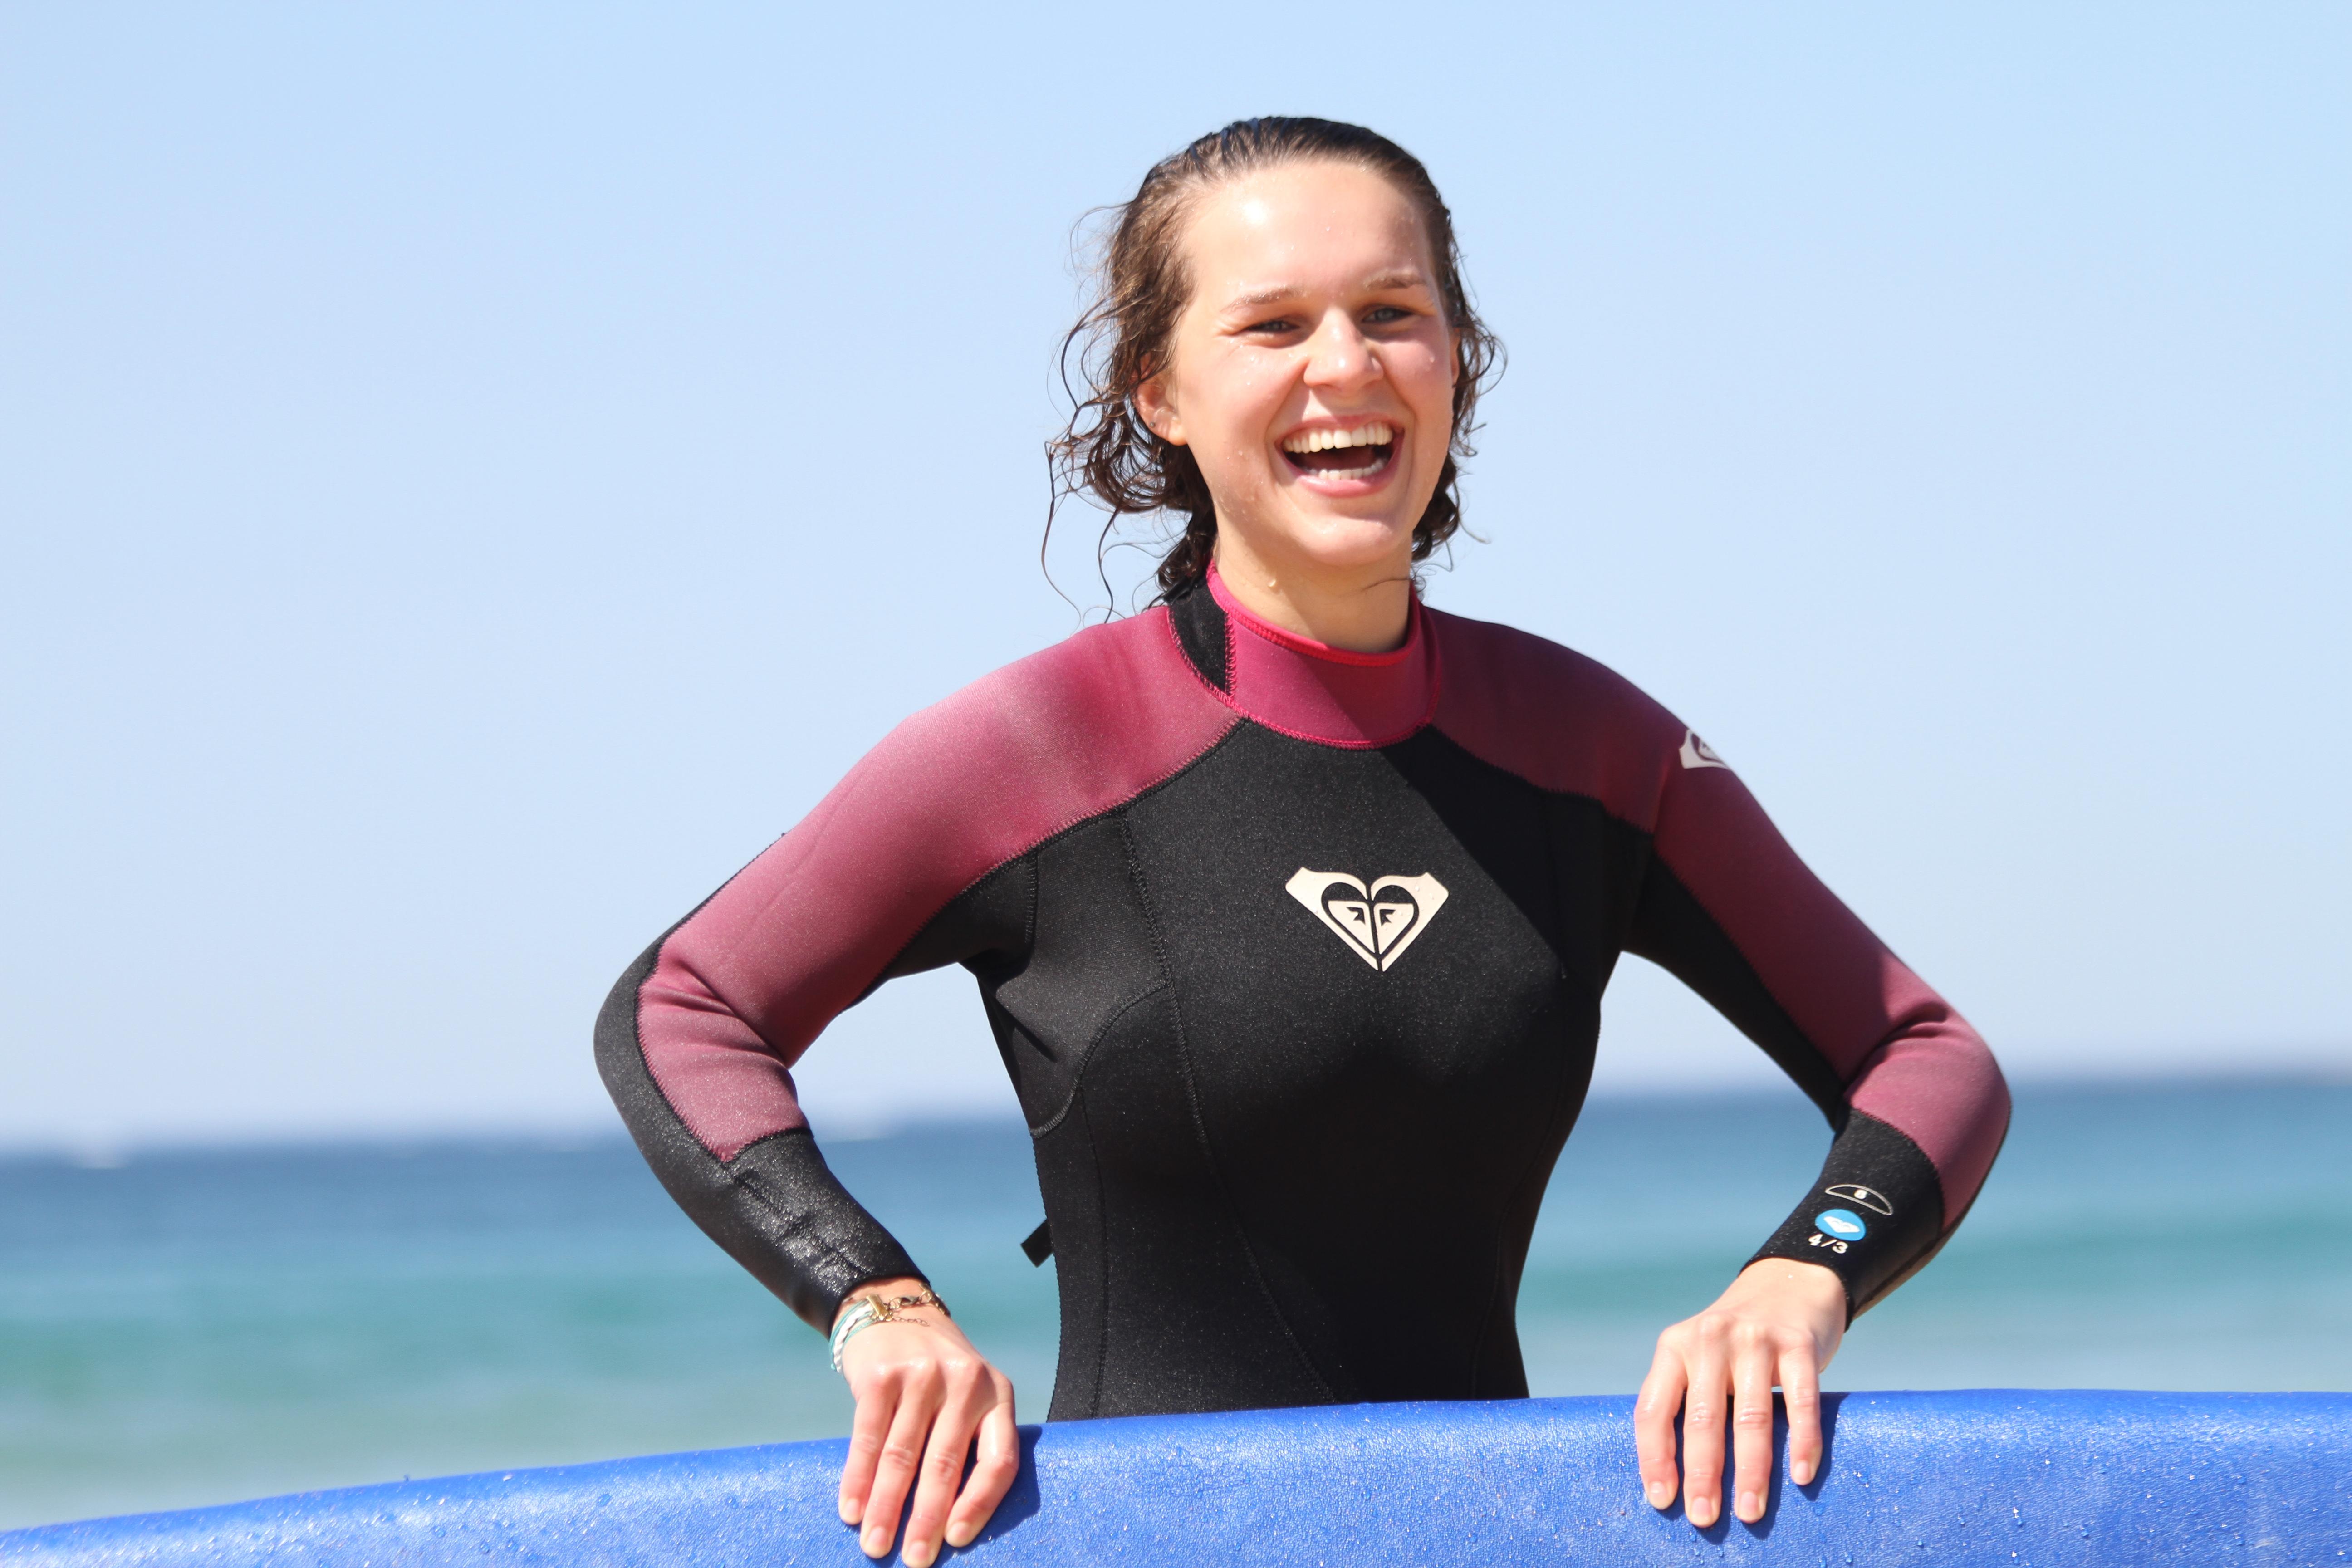 Oyster Worldwide – Surf Camp & Development Course in Australia